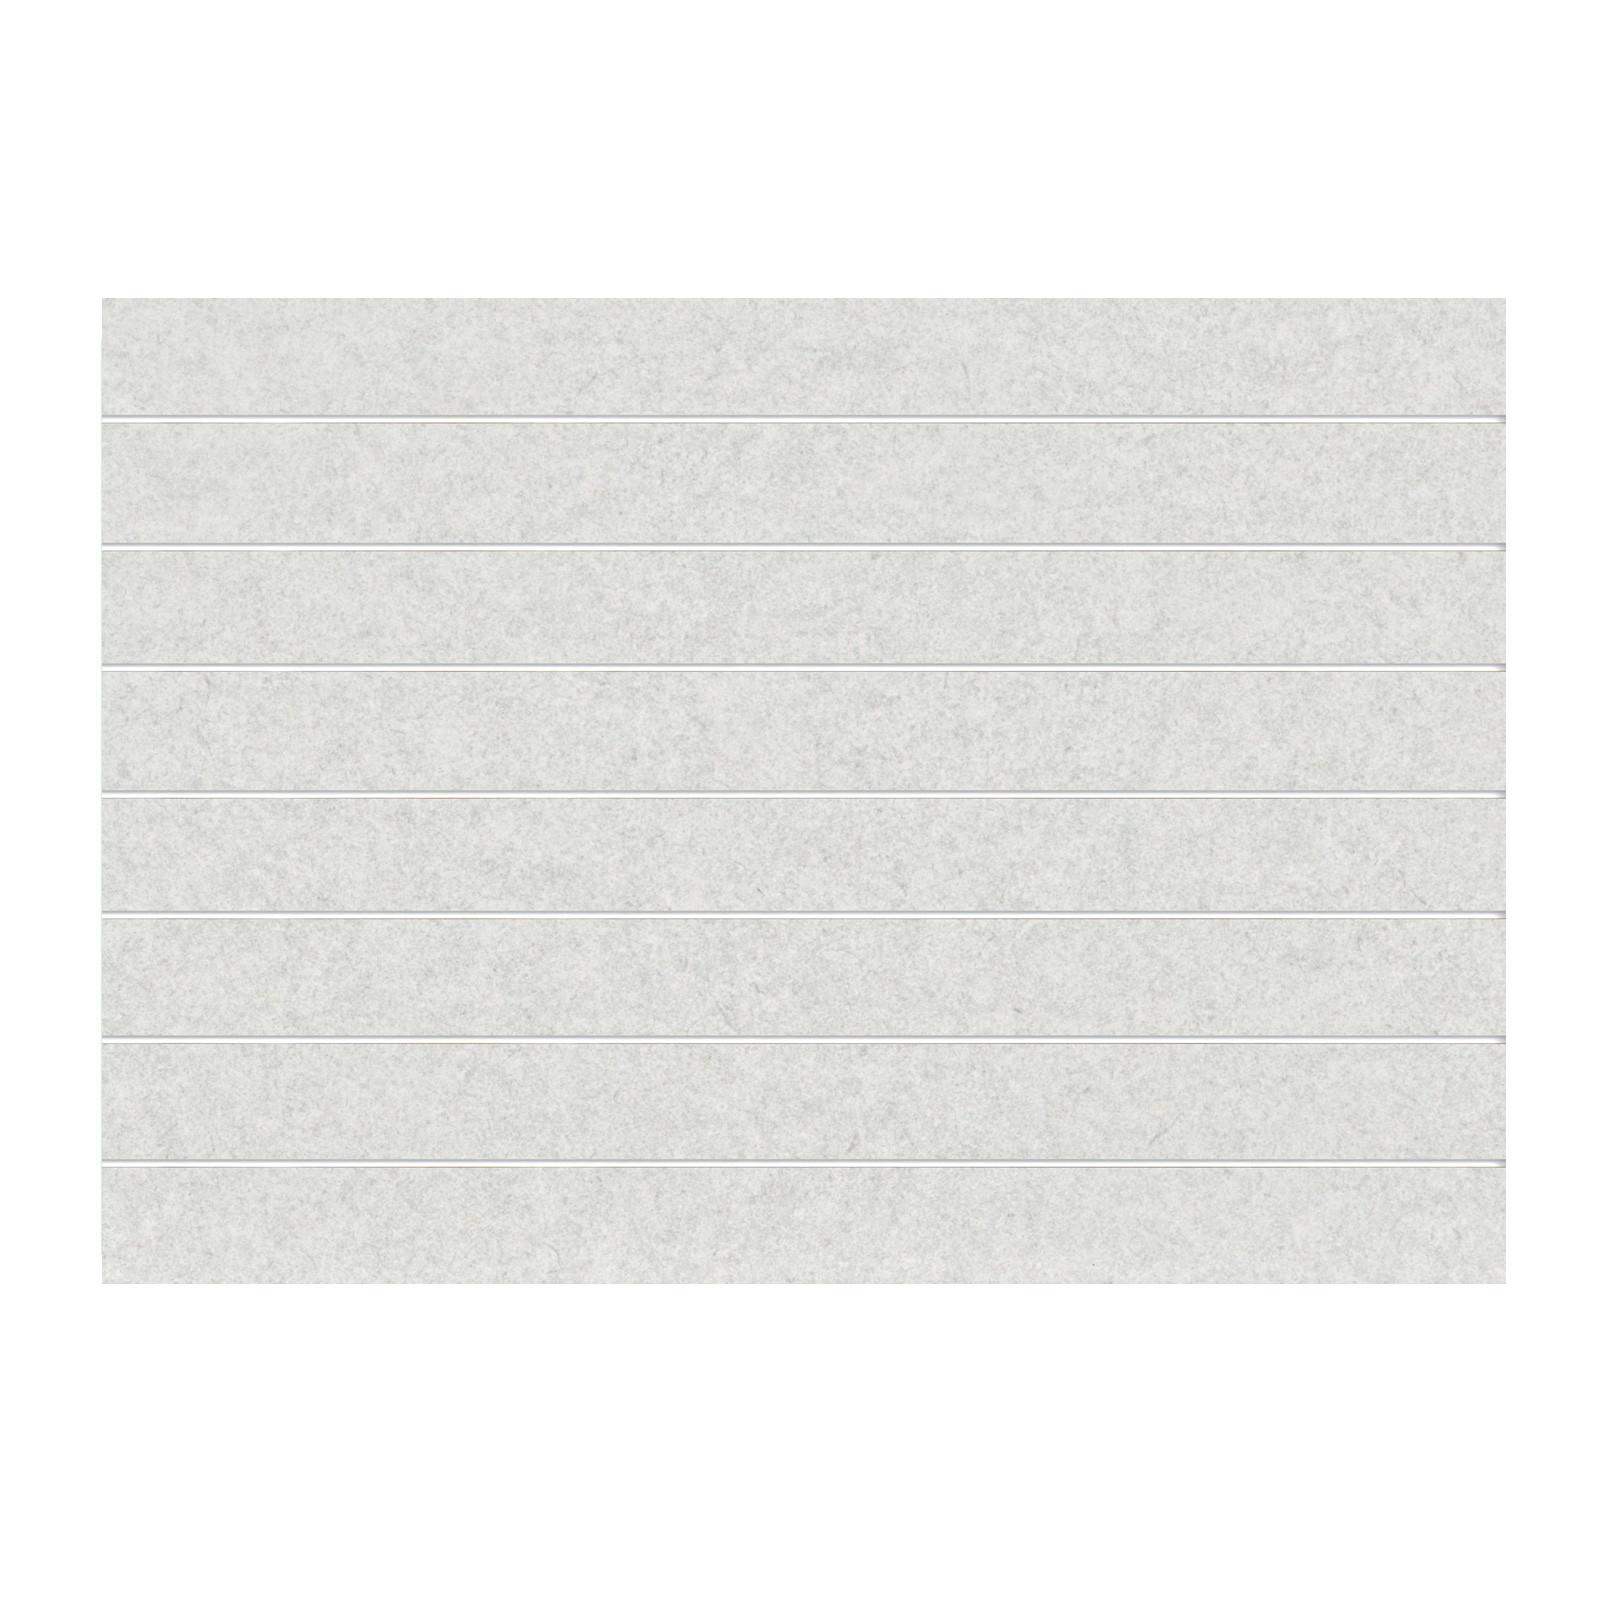 Marbella arena relieve wall tile Bathroom tiles design catalog